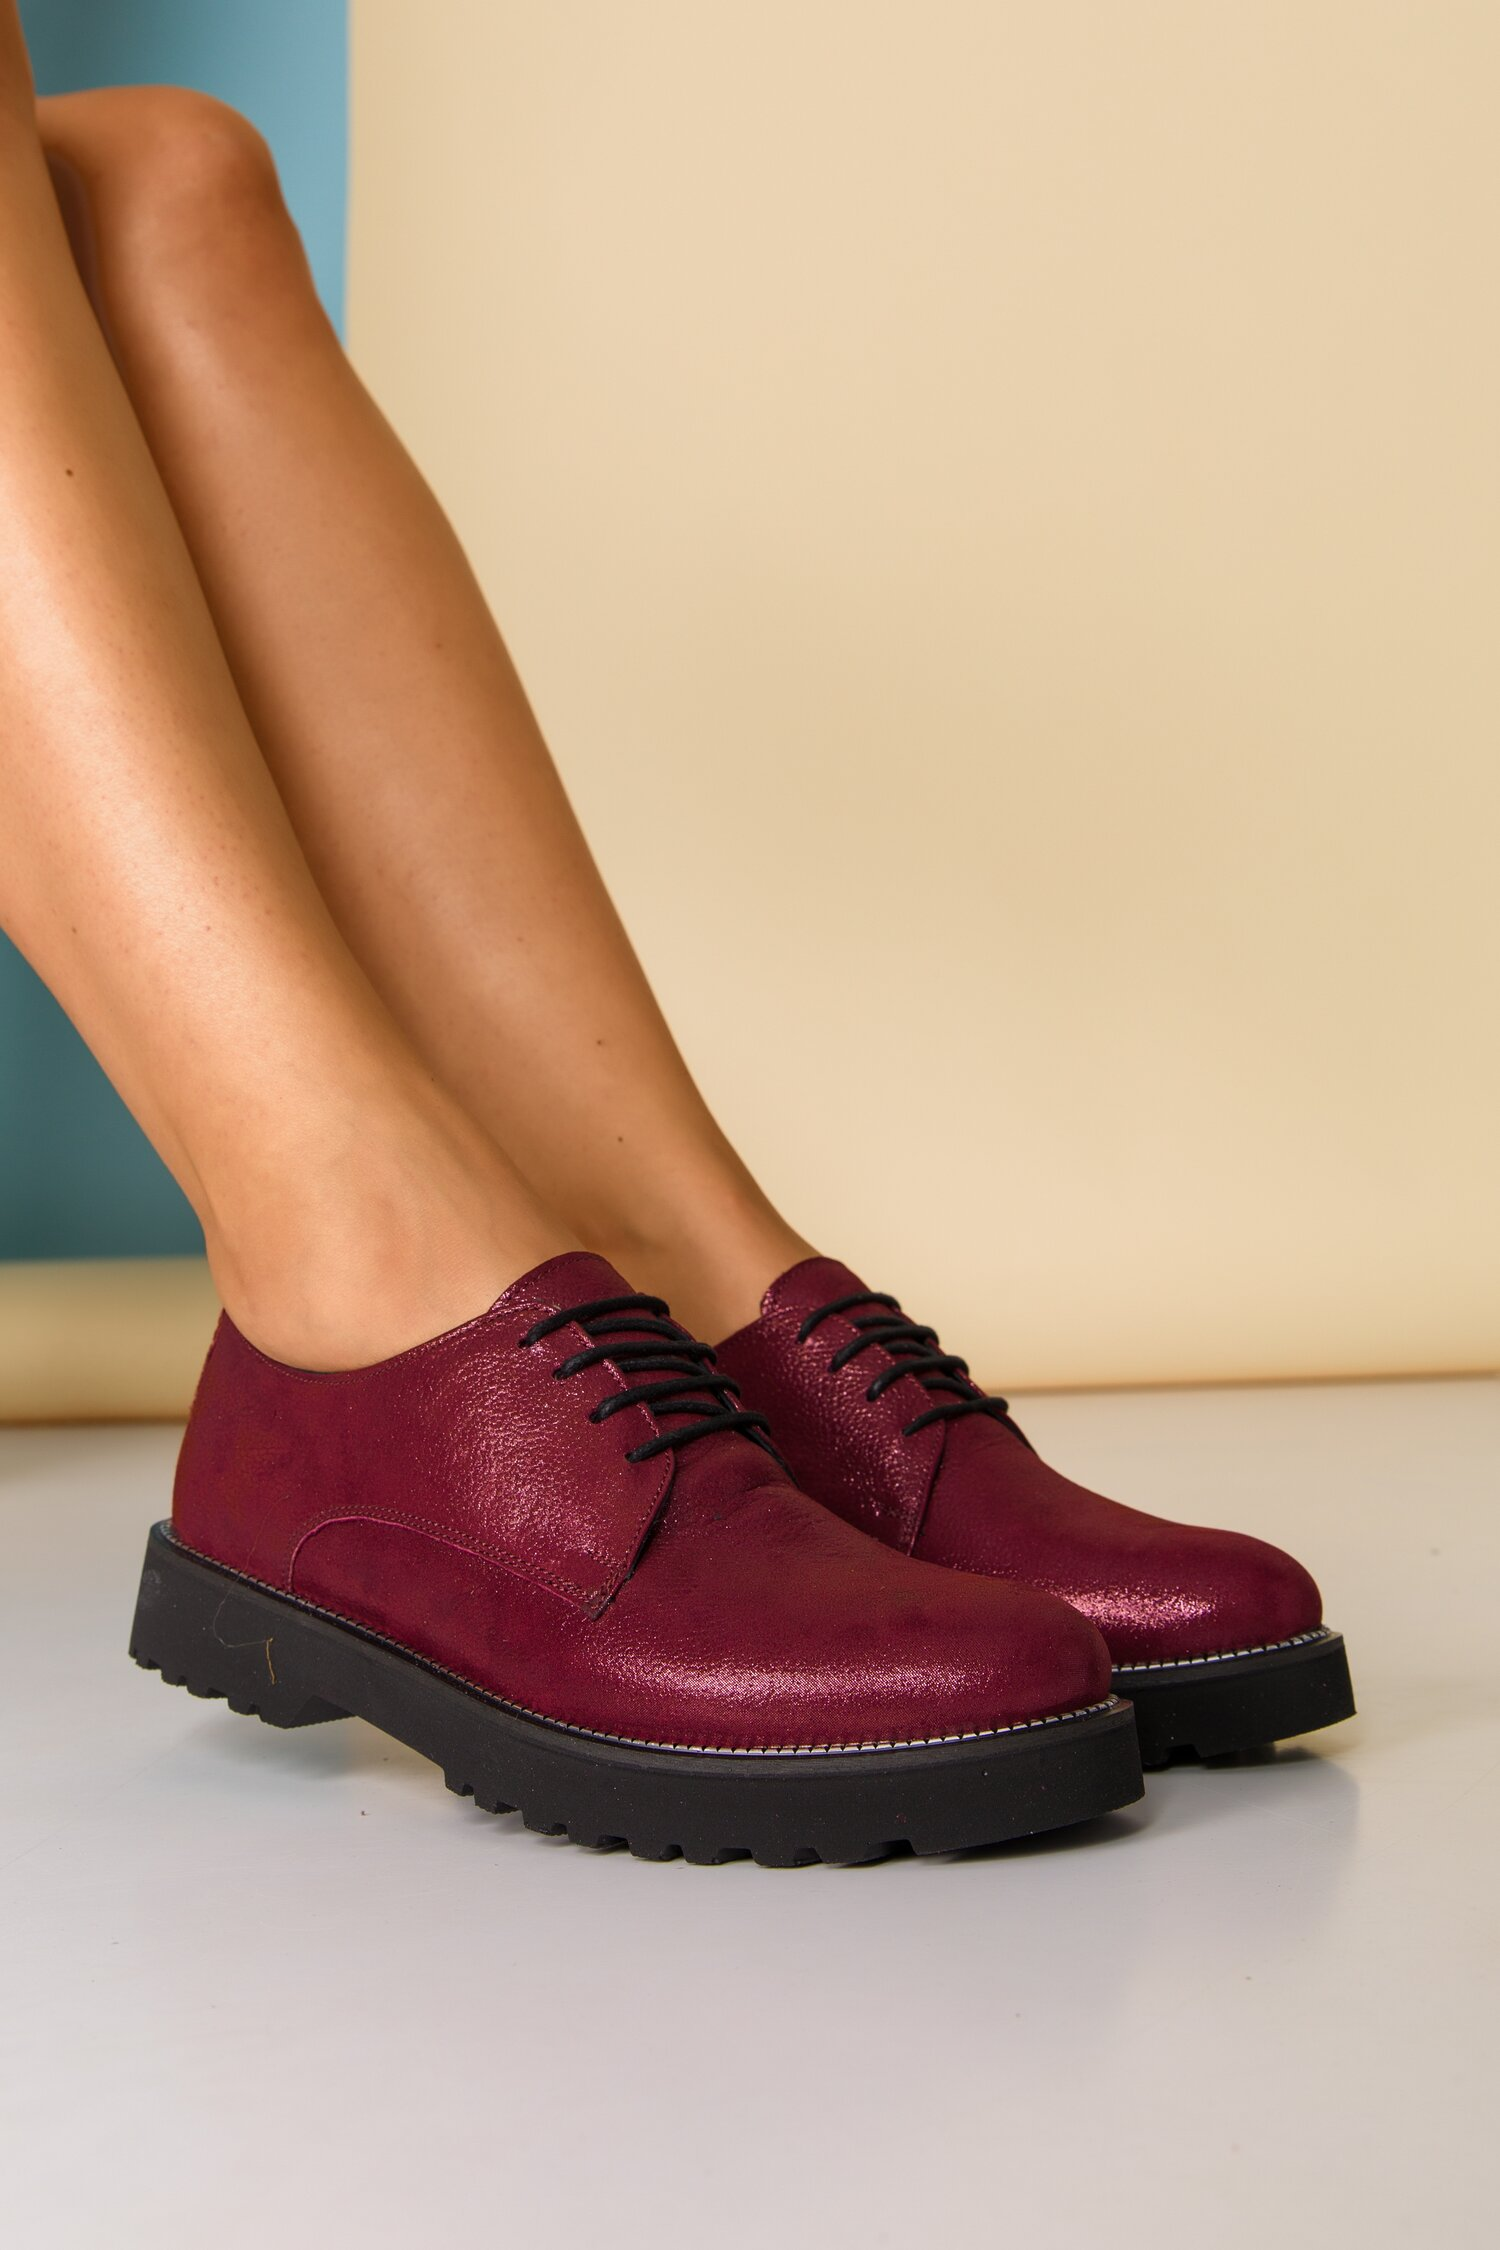 Pantofi Oxford bordo sidefat cu sireturi